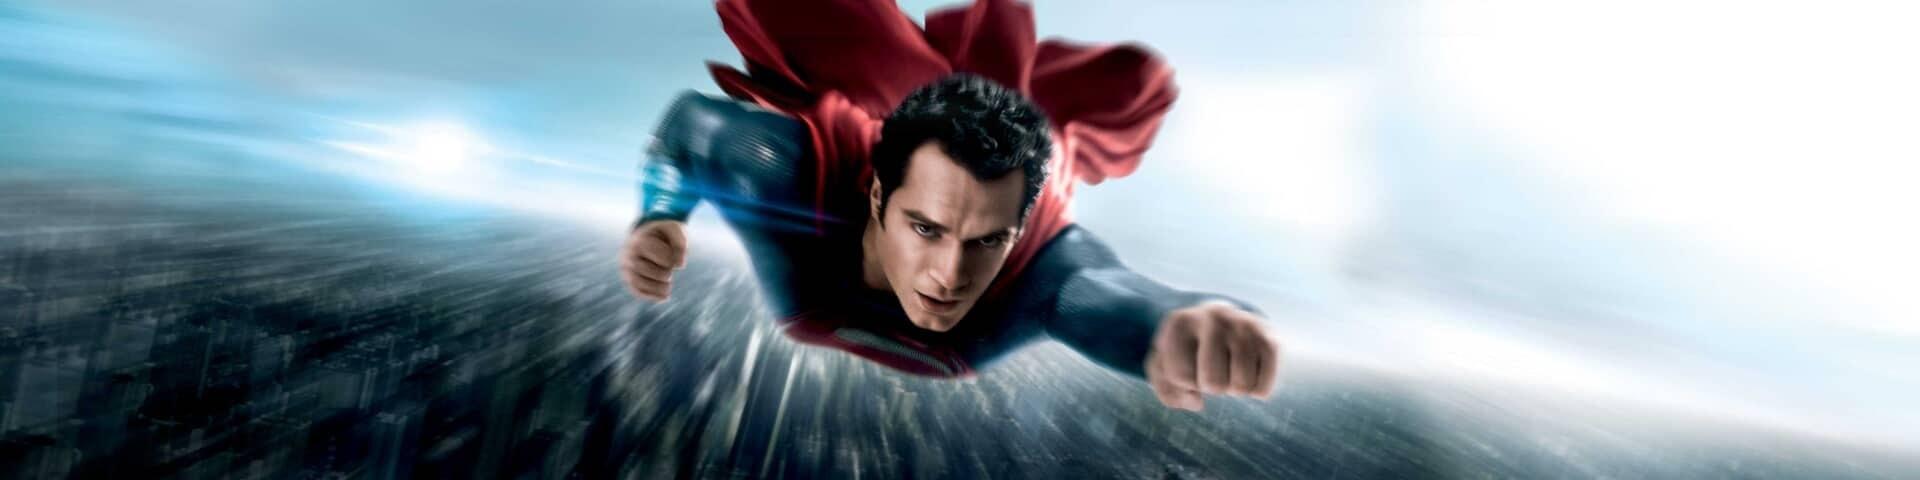 Warnerbros Com Man Of Steel Movies